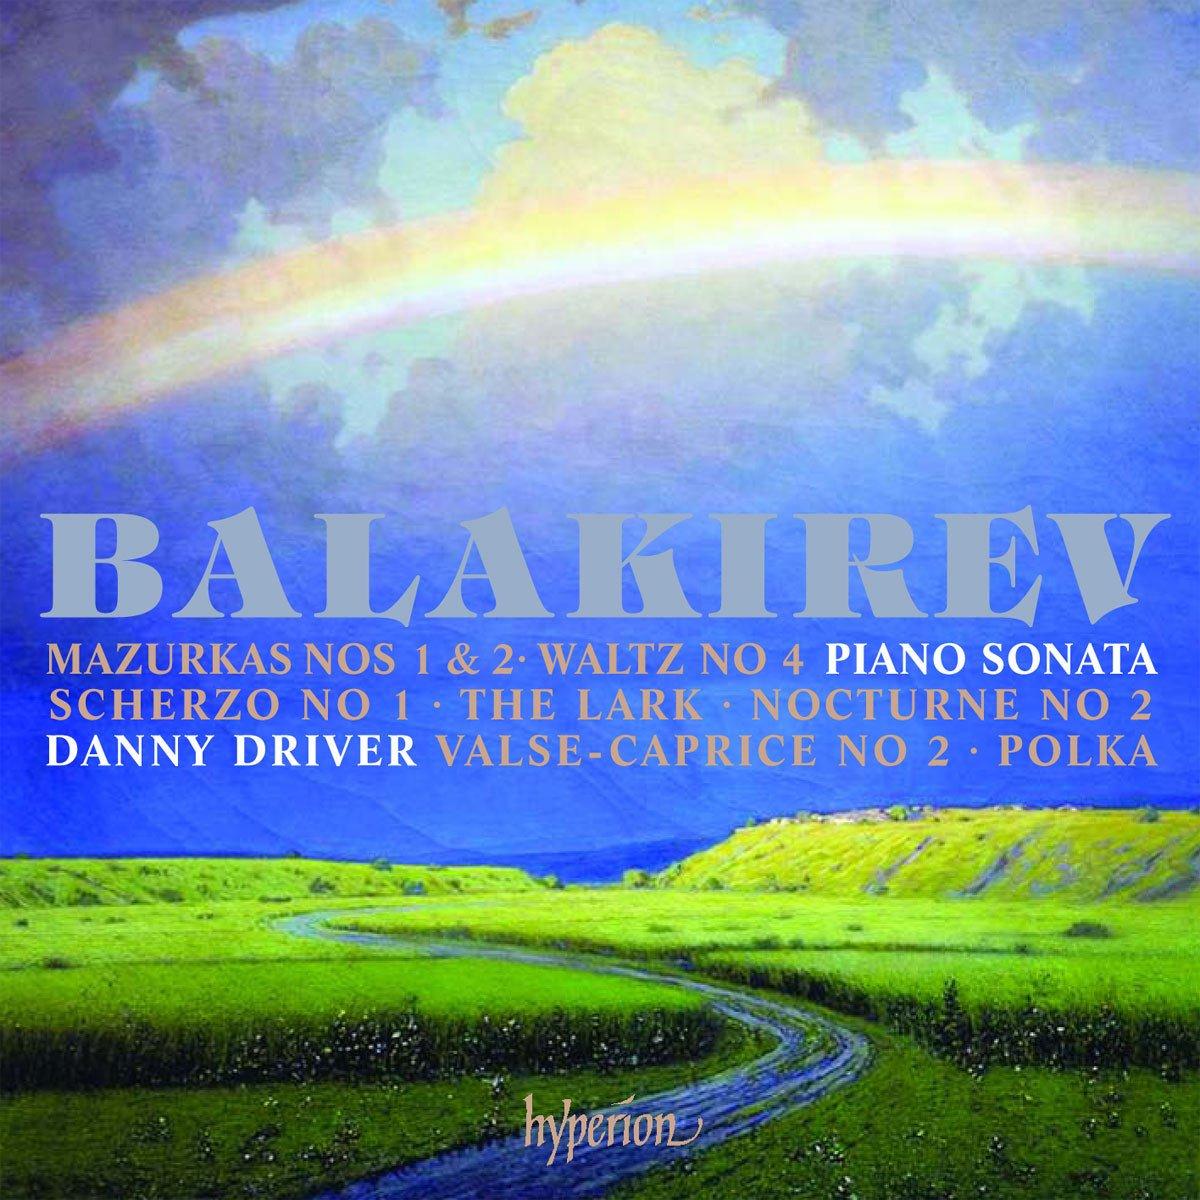 Balakirev: Piano Sonata, Nocturne No.2, Mazurkas Nos.1 & 2 by HYPERION